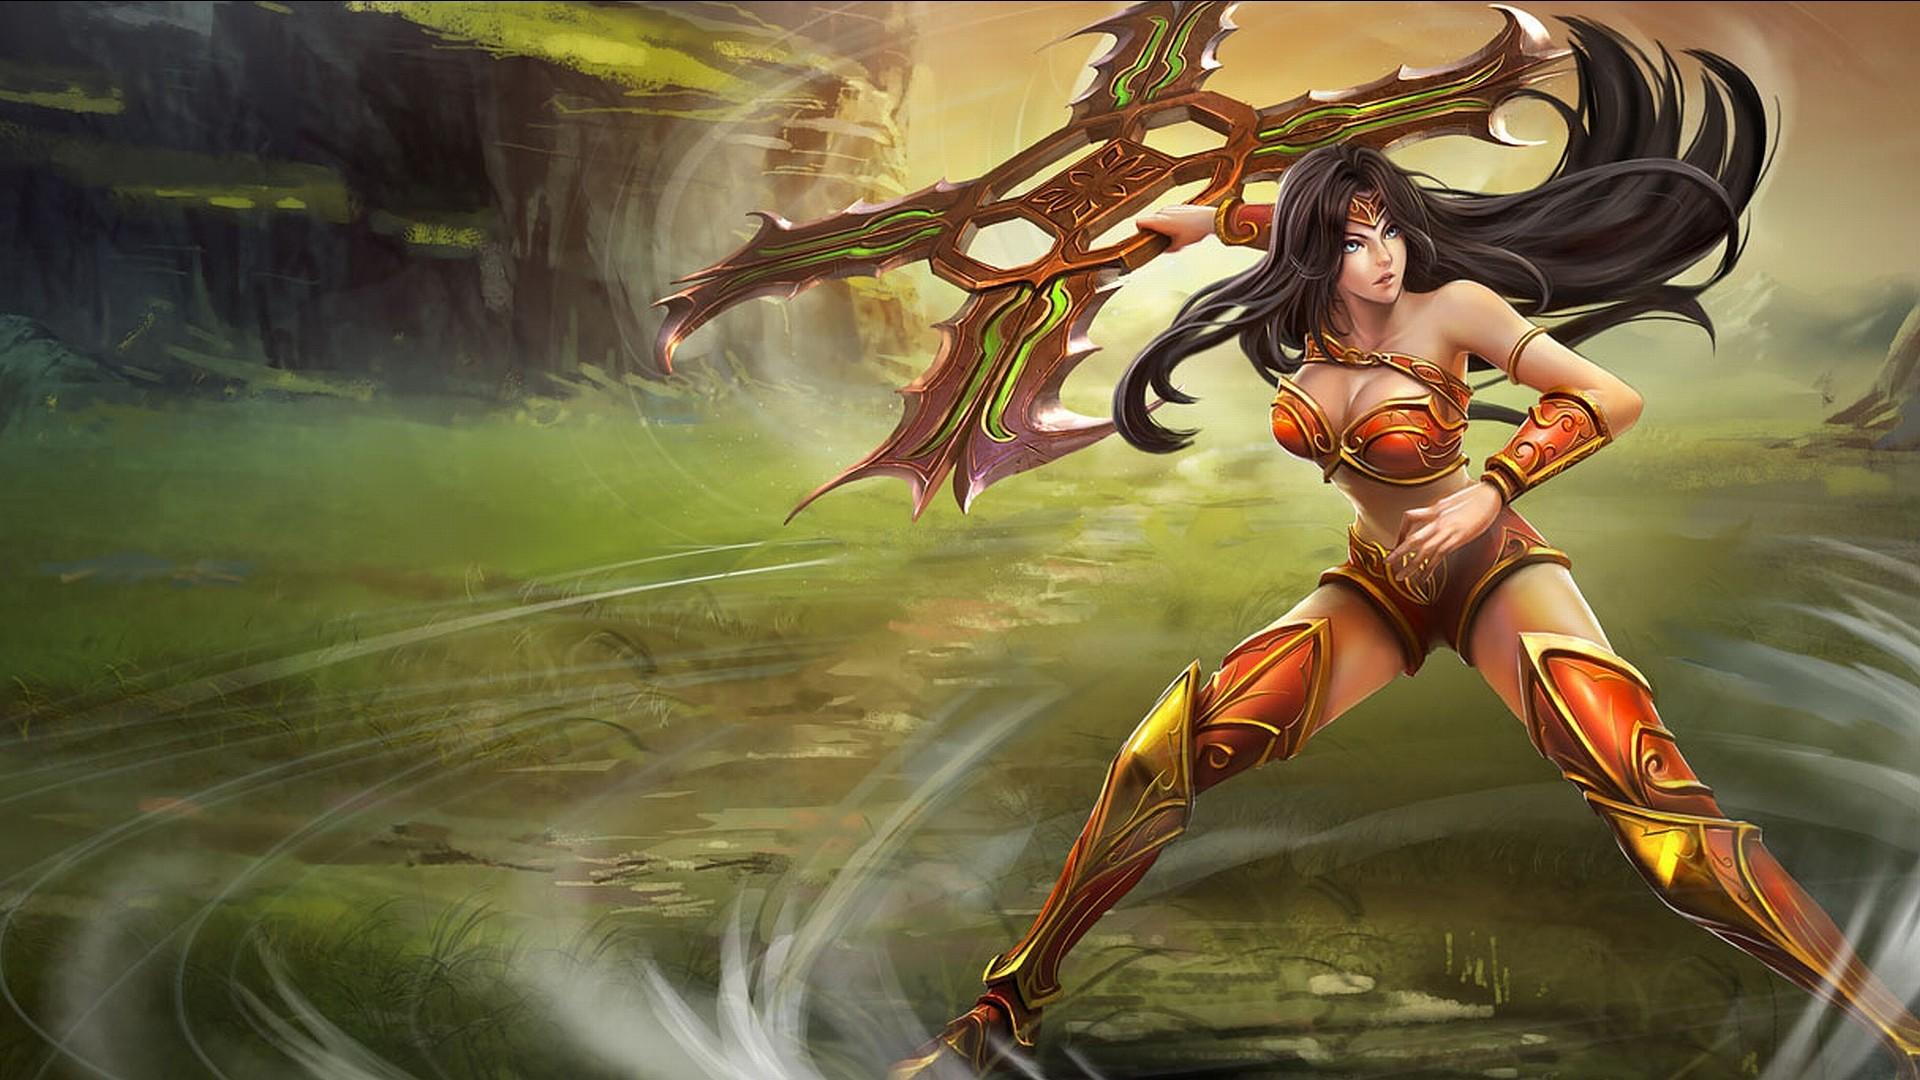 Download Free fantasy Wallpapers | women warrior Wallpaper Backgrounds |  WallpaperBackgrounds.com